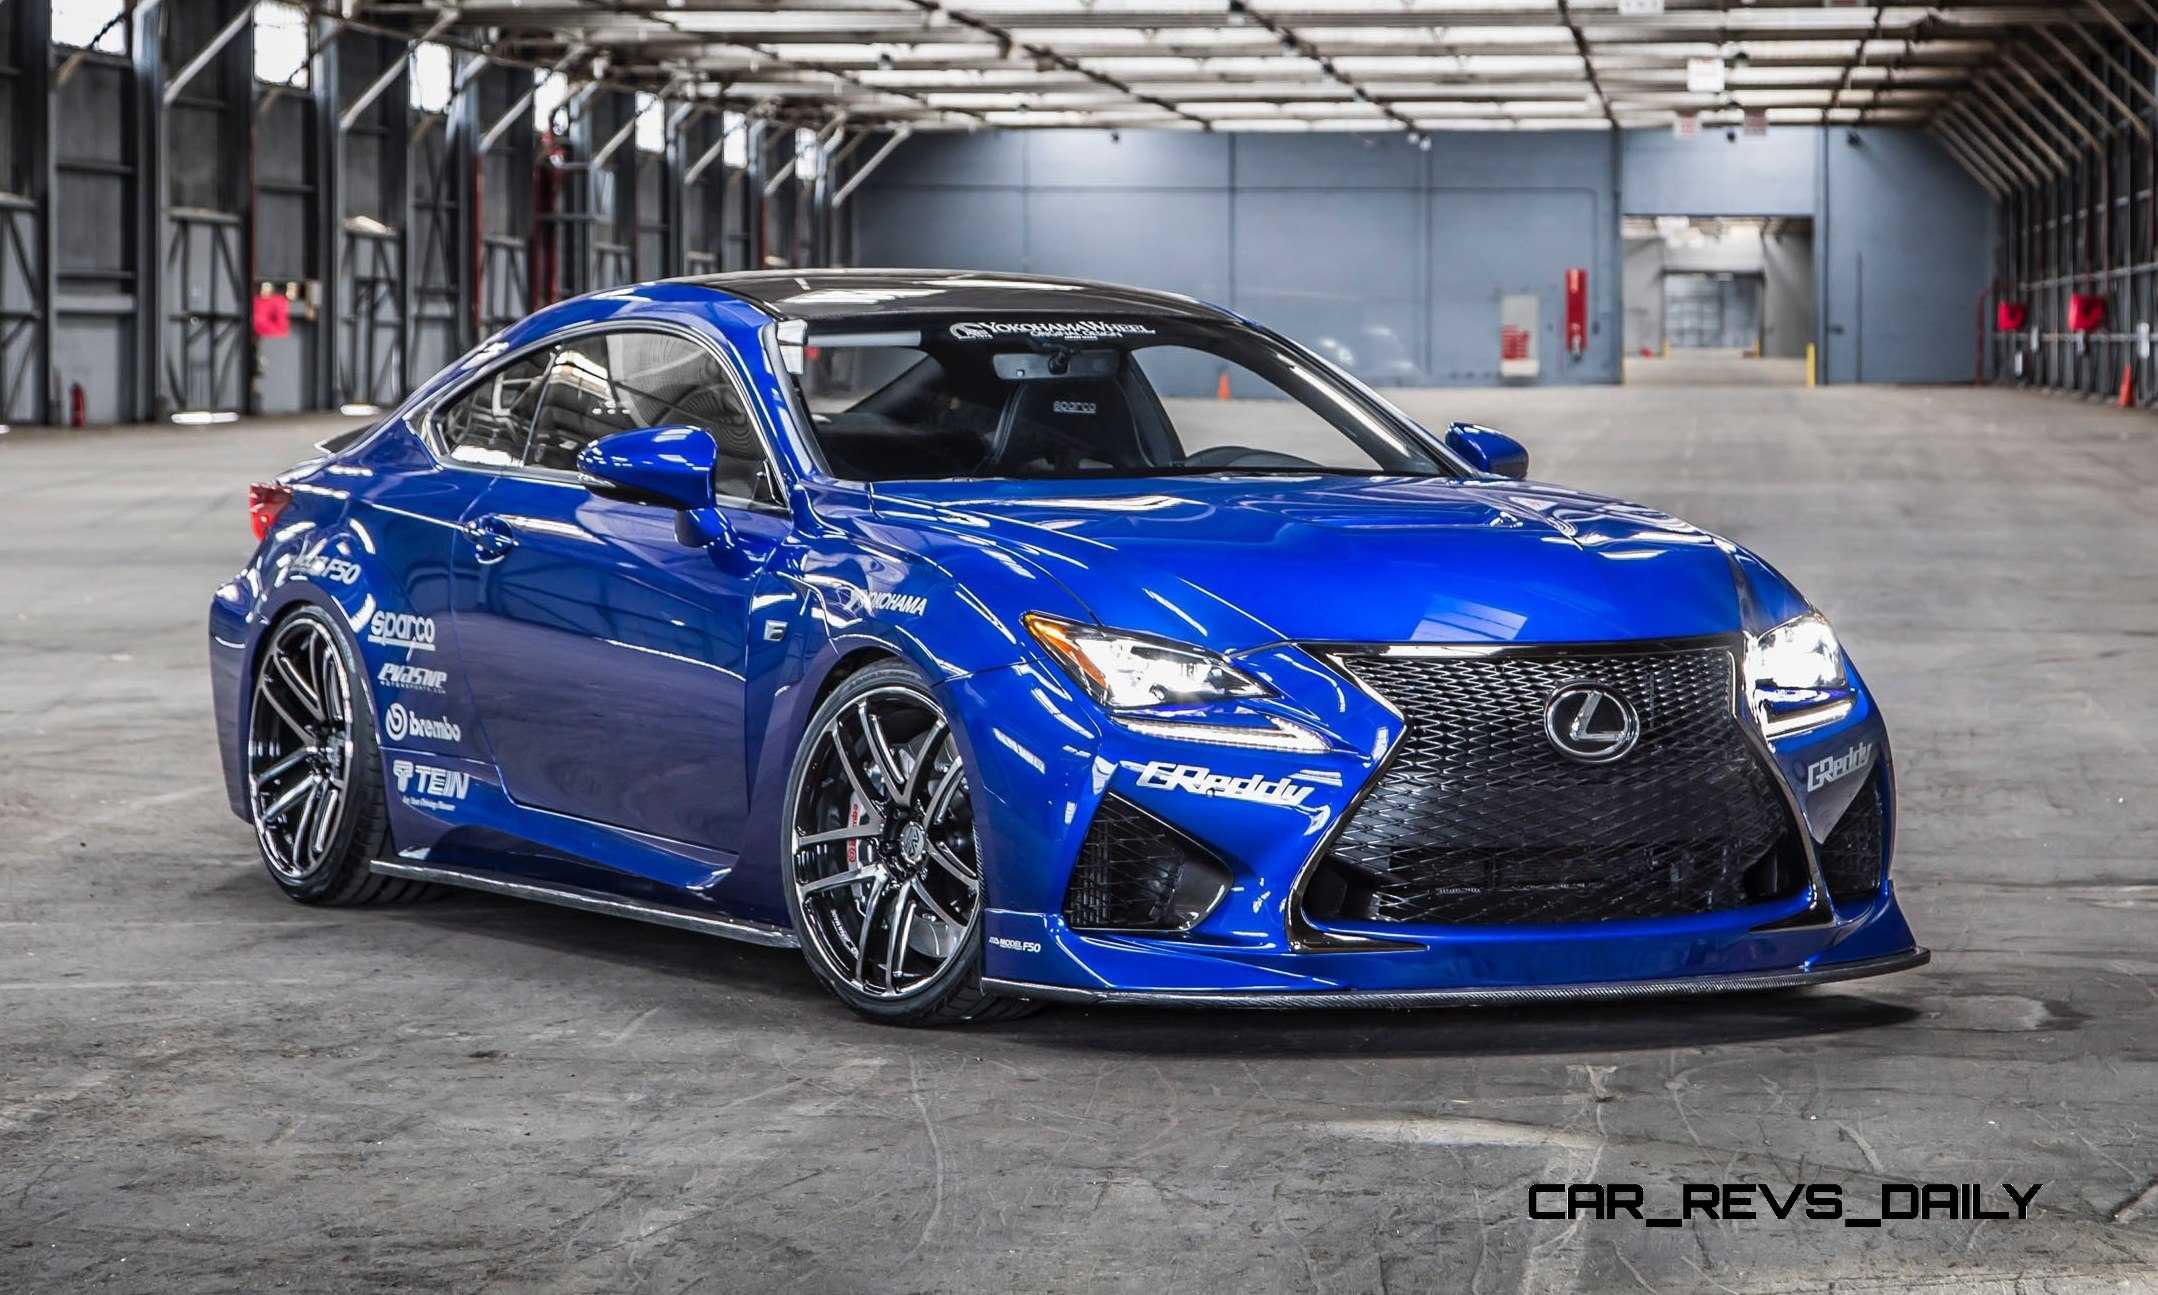 Supreme Car Wallpaper Best Of Sema 2015 Lexus Rc F By Gordon Ting In 27 High